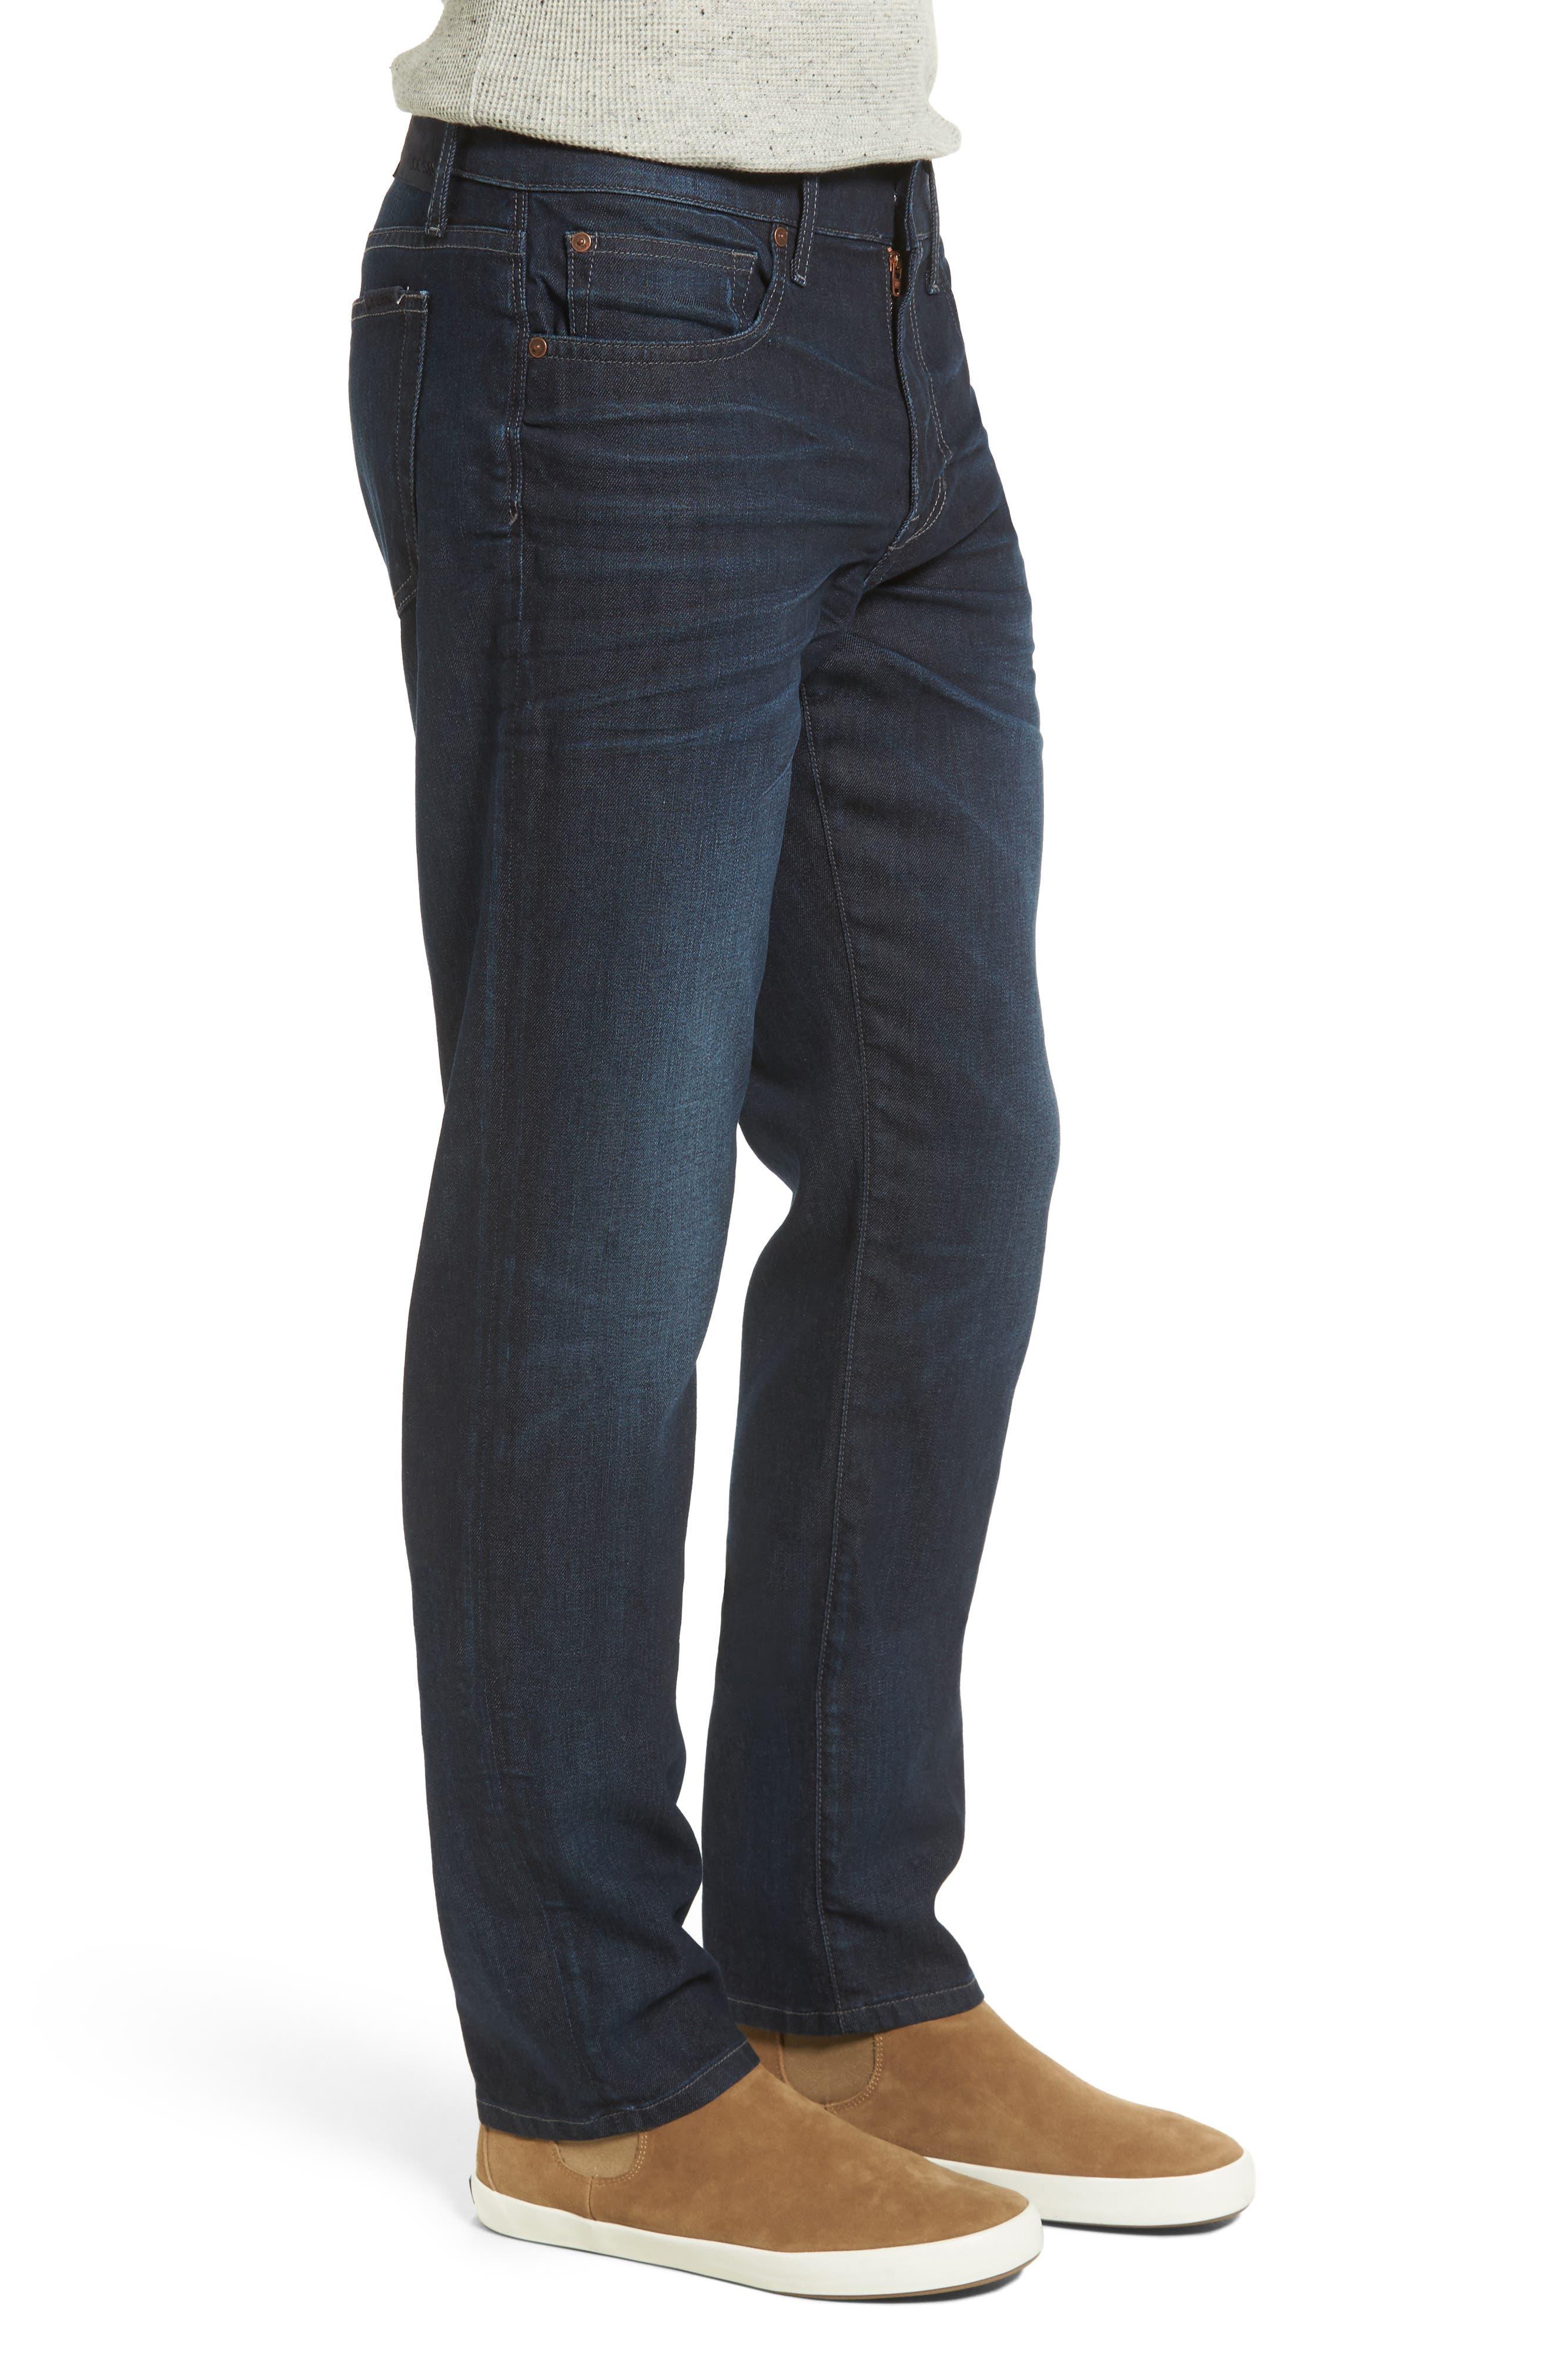 Brixton Slim Straight Leg Jeans,                             Alternate thumbnail 3, color,                             430